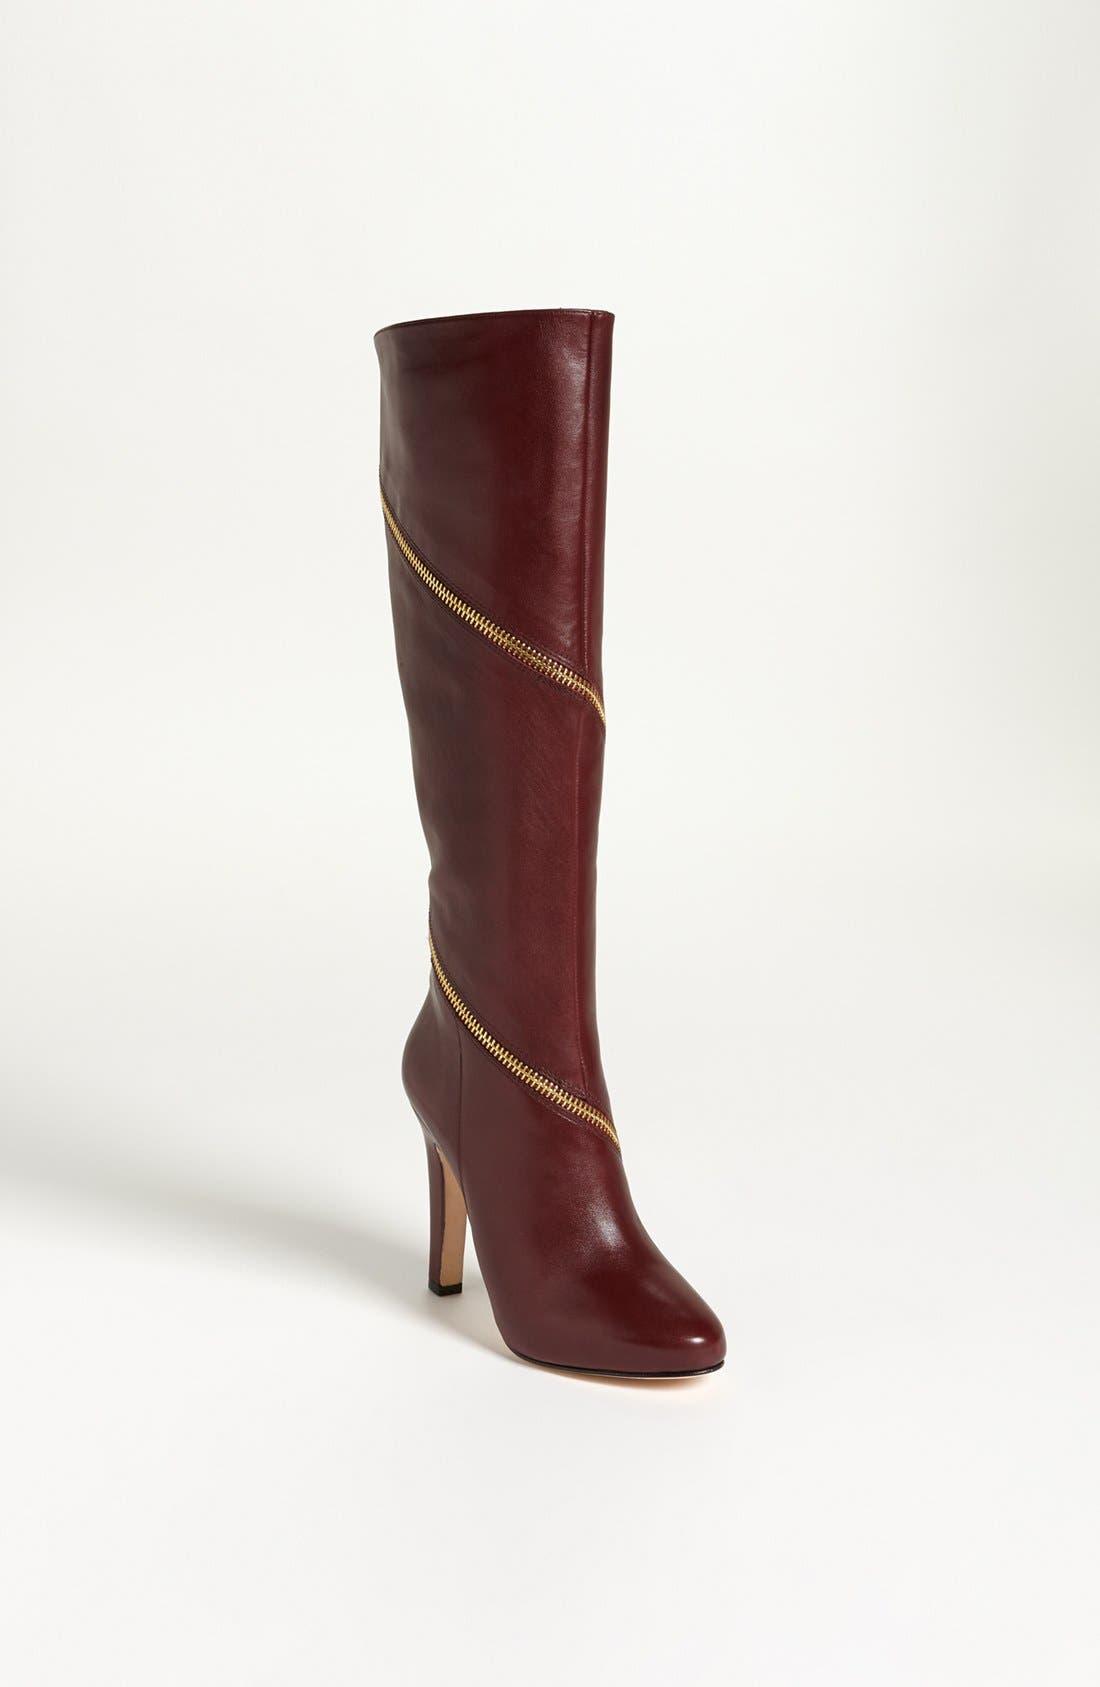 Alternate Image 1 Selected - Diane von Furstenberg 'Cambria' Boot (Online Only)